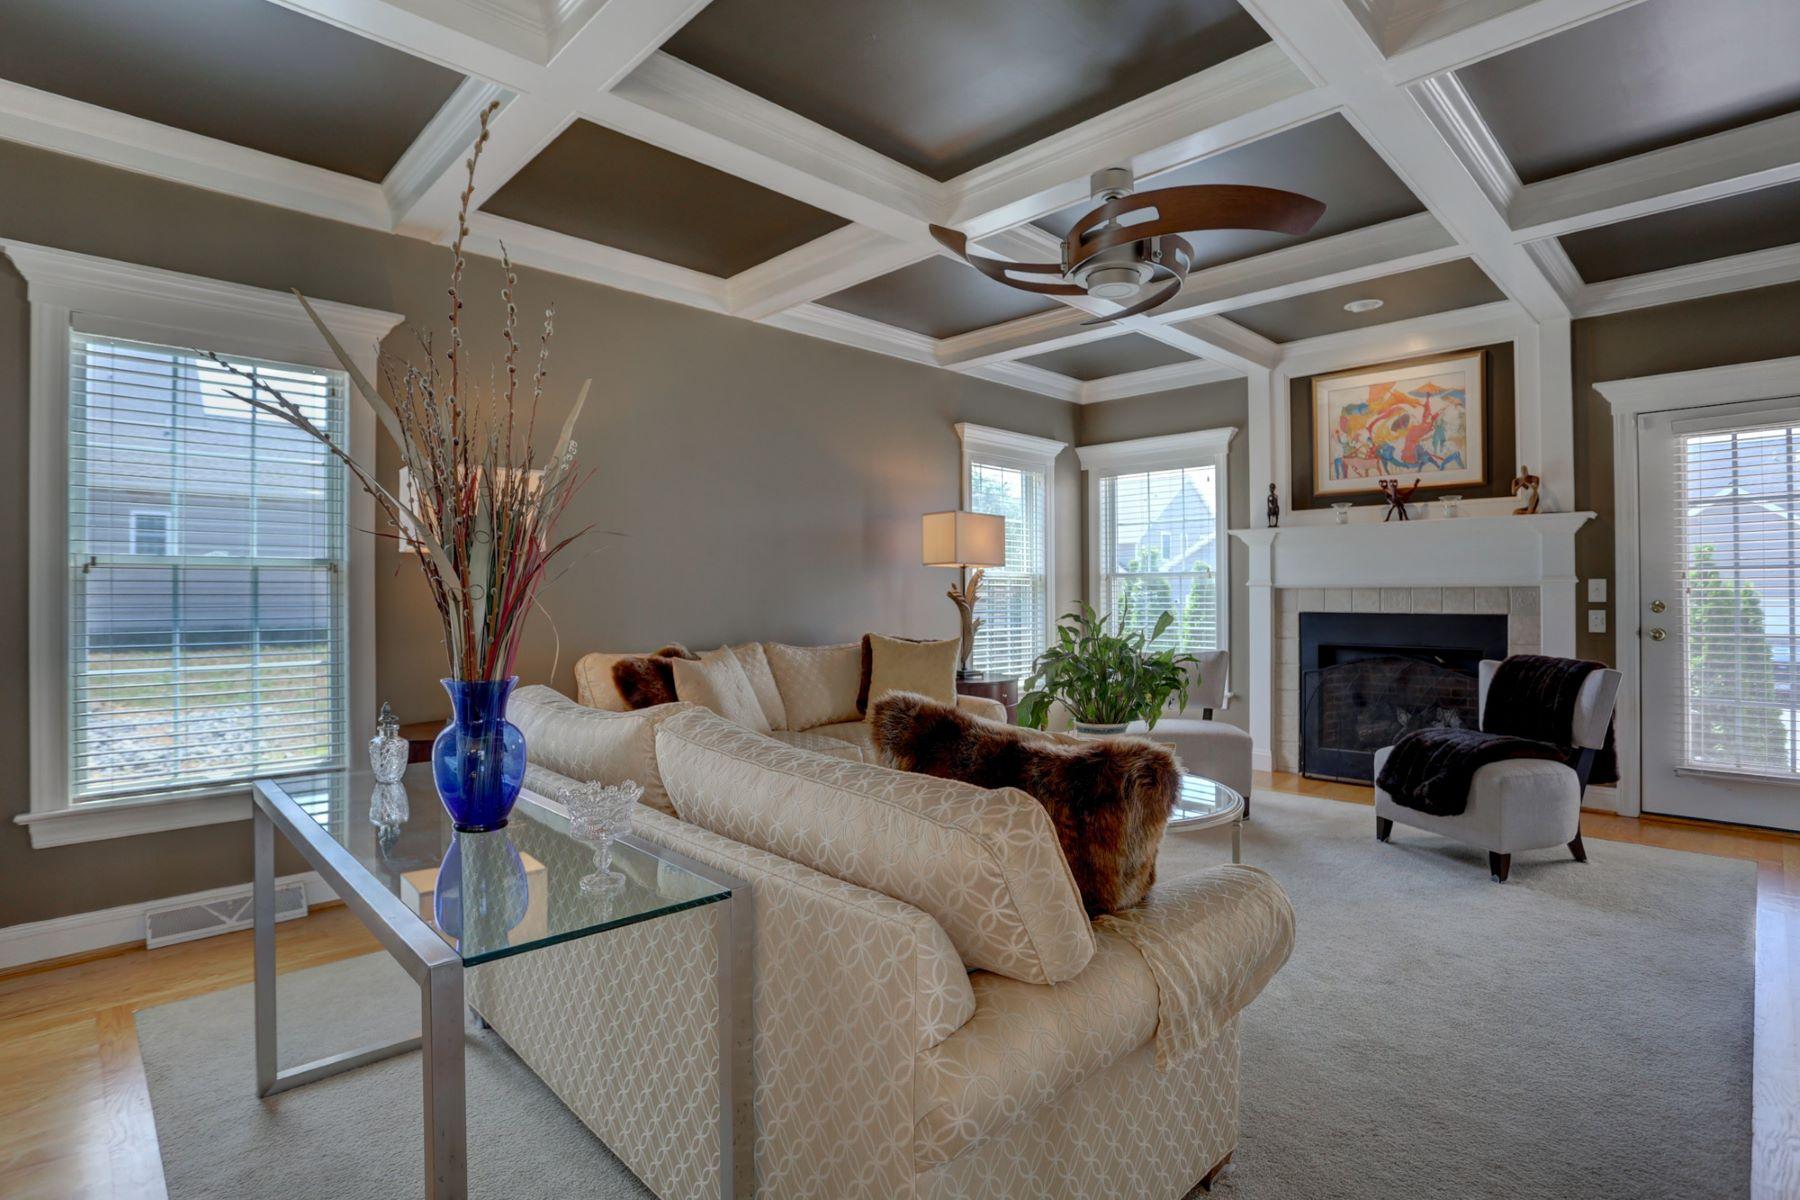 Additional photo for property listing at 652 Richmond Drive 652 Richmond Drive 兰开斯特, 宾夕法尼亚州 17601 美国